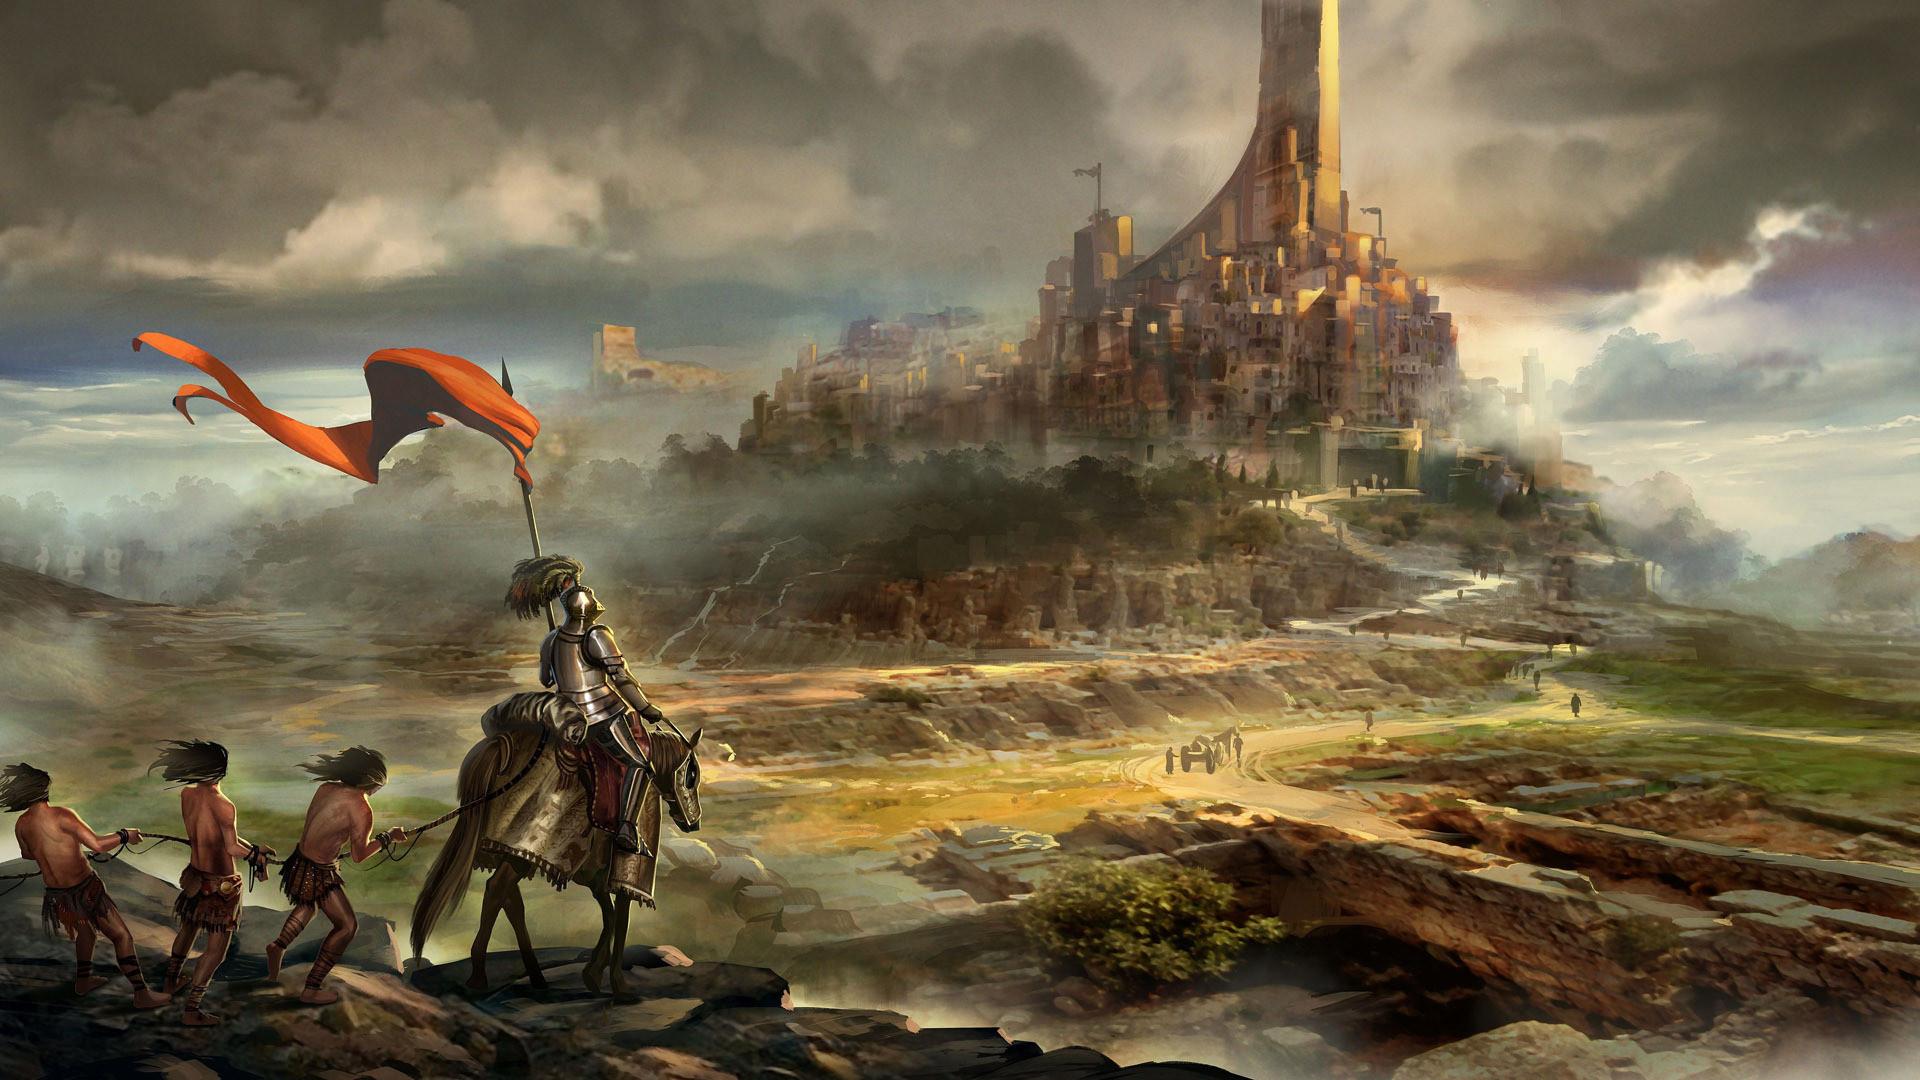 <b>Medieval Battle Wallpaper</b> 27338   RIMEDIA